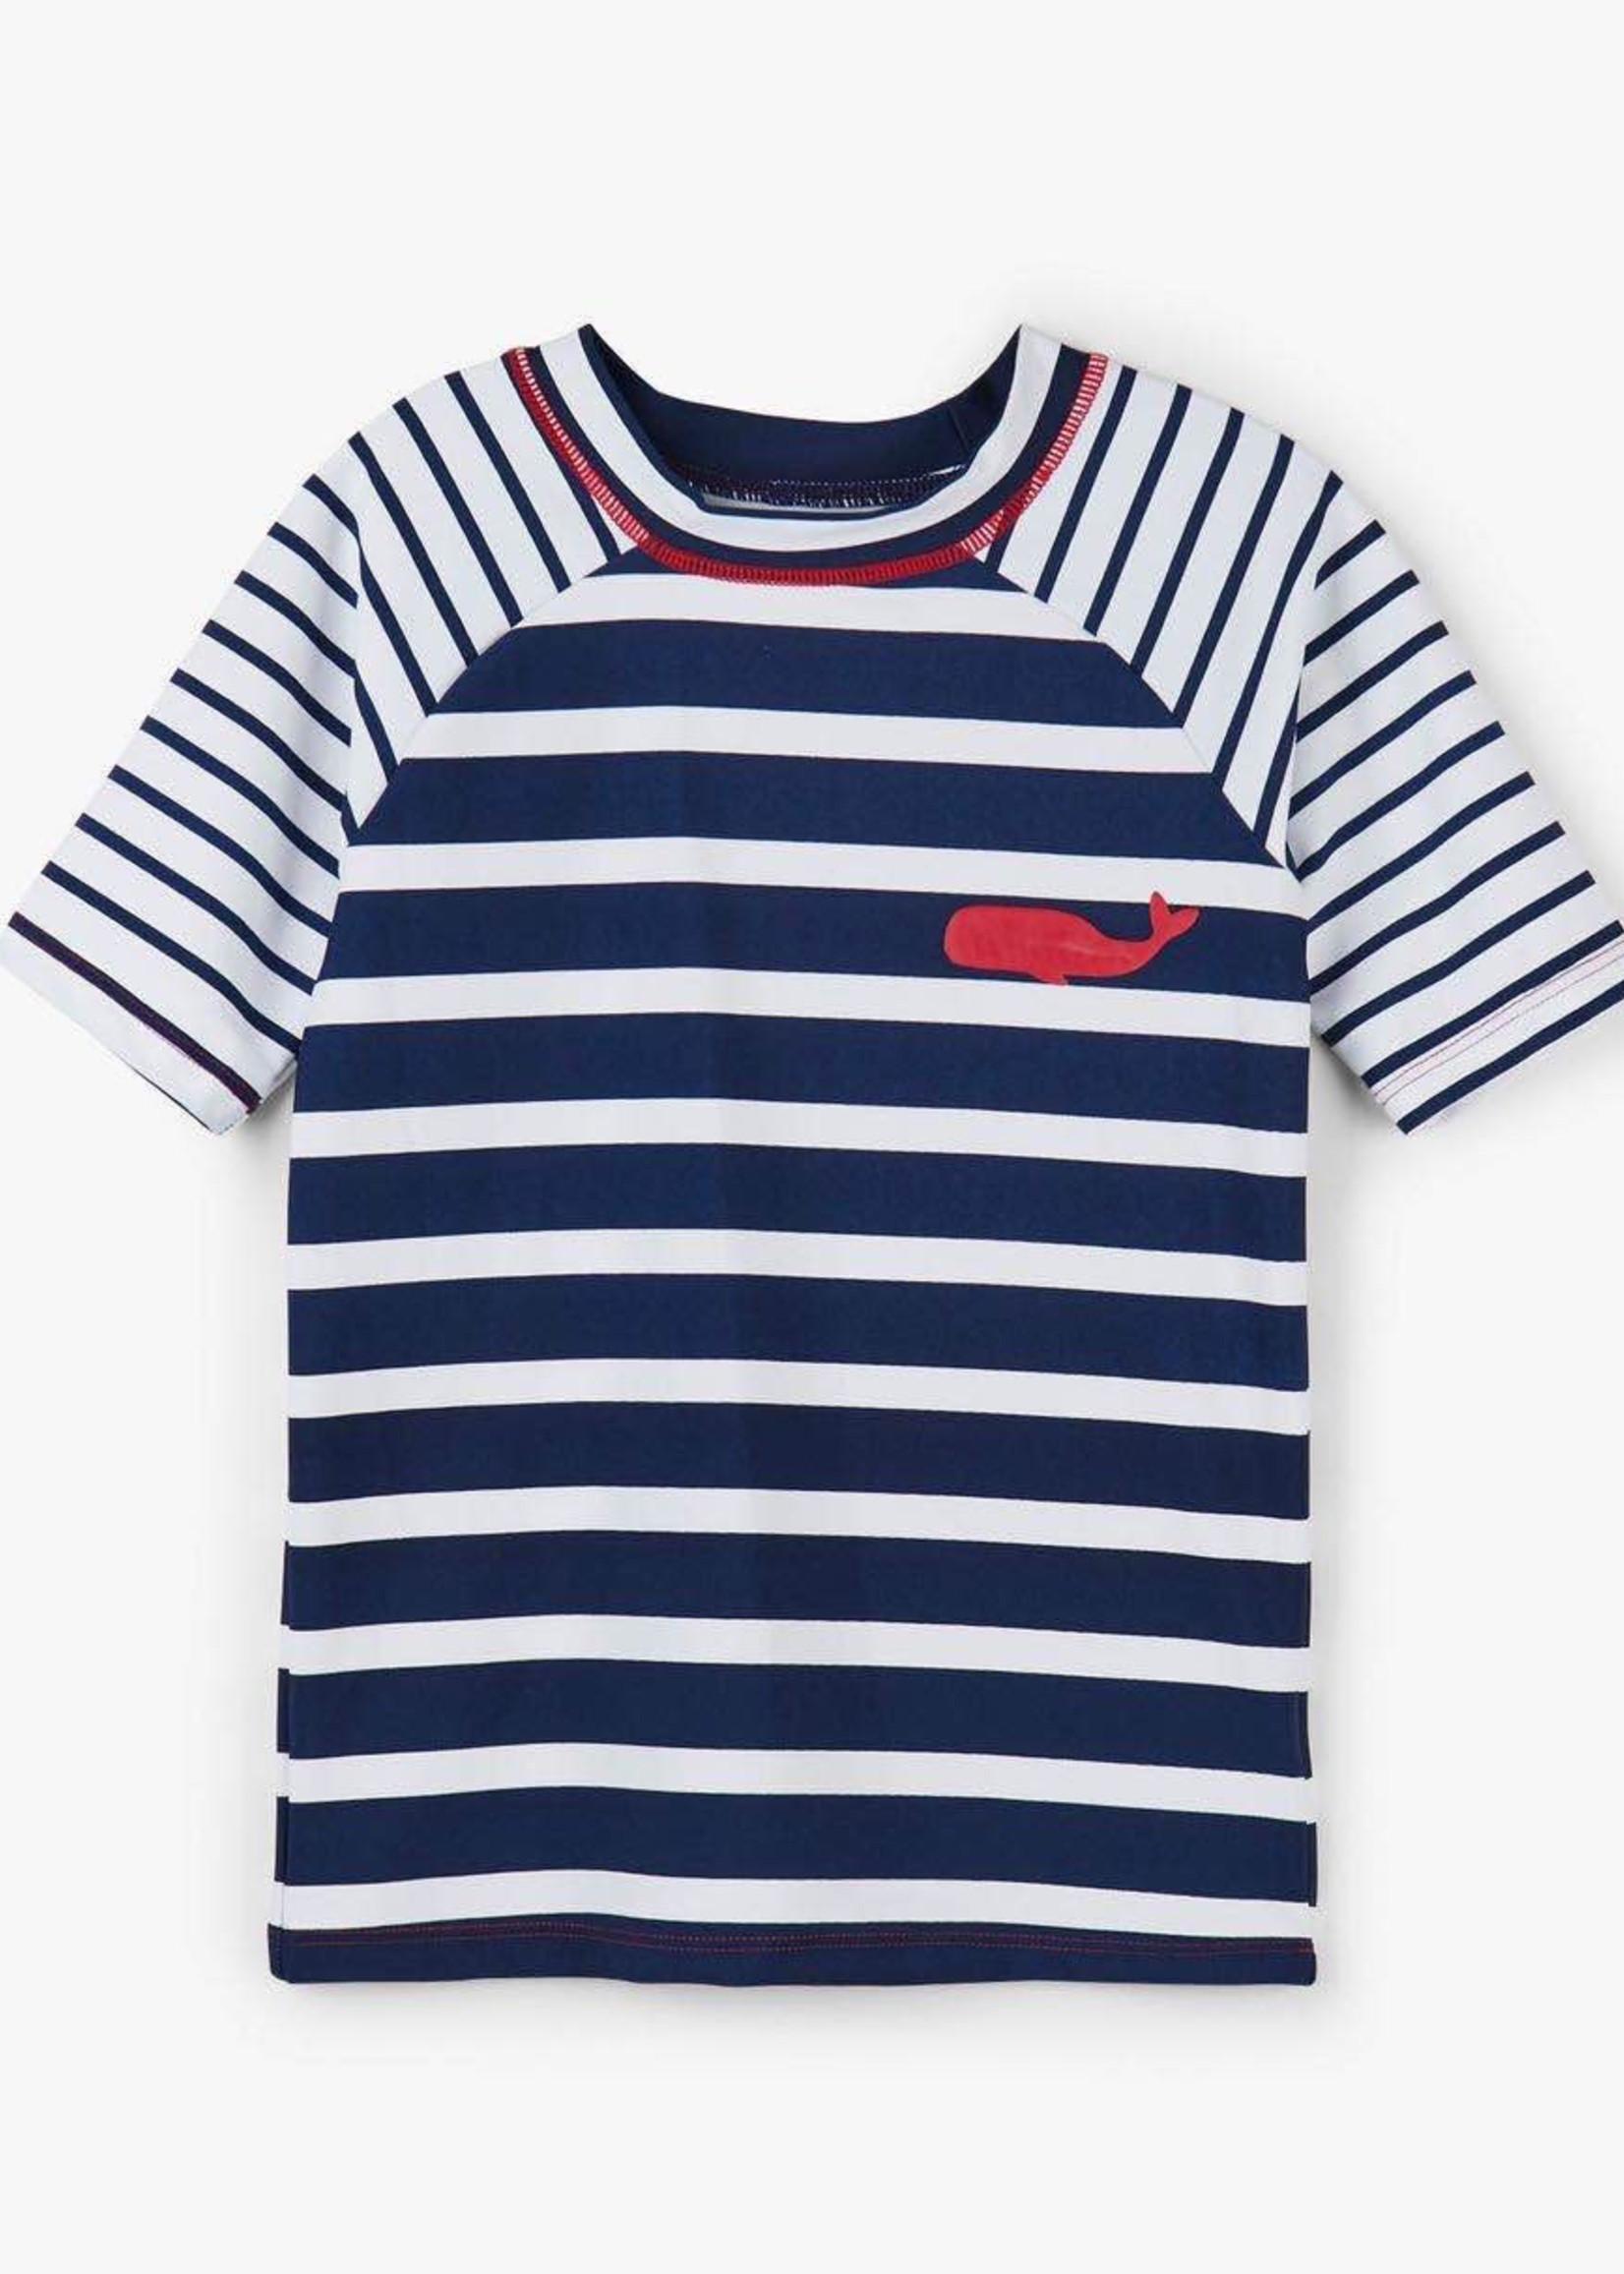 Hatley Hatley Swim Top (Nautical Stripe)